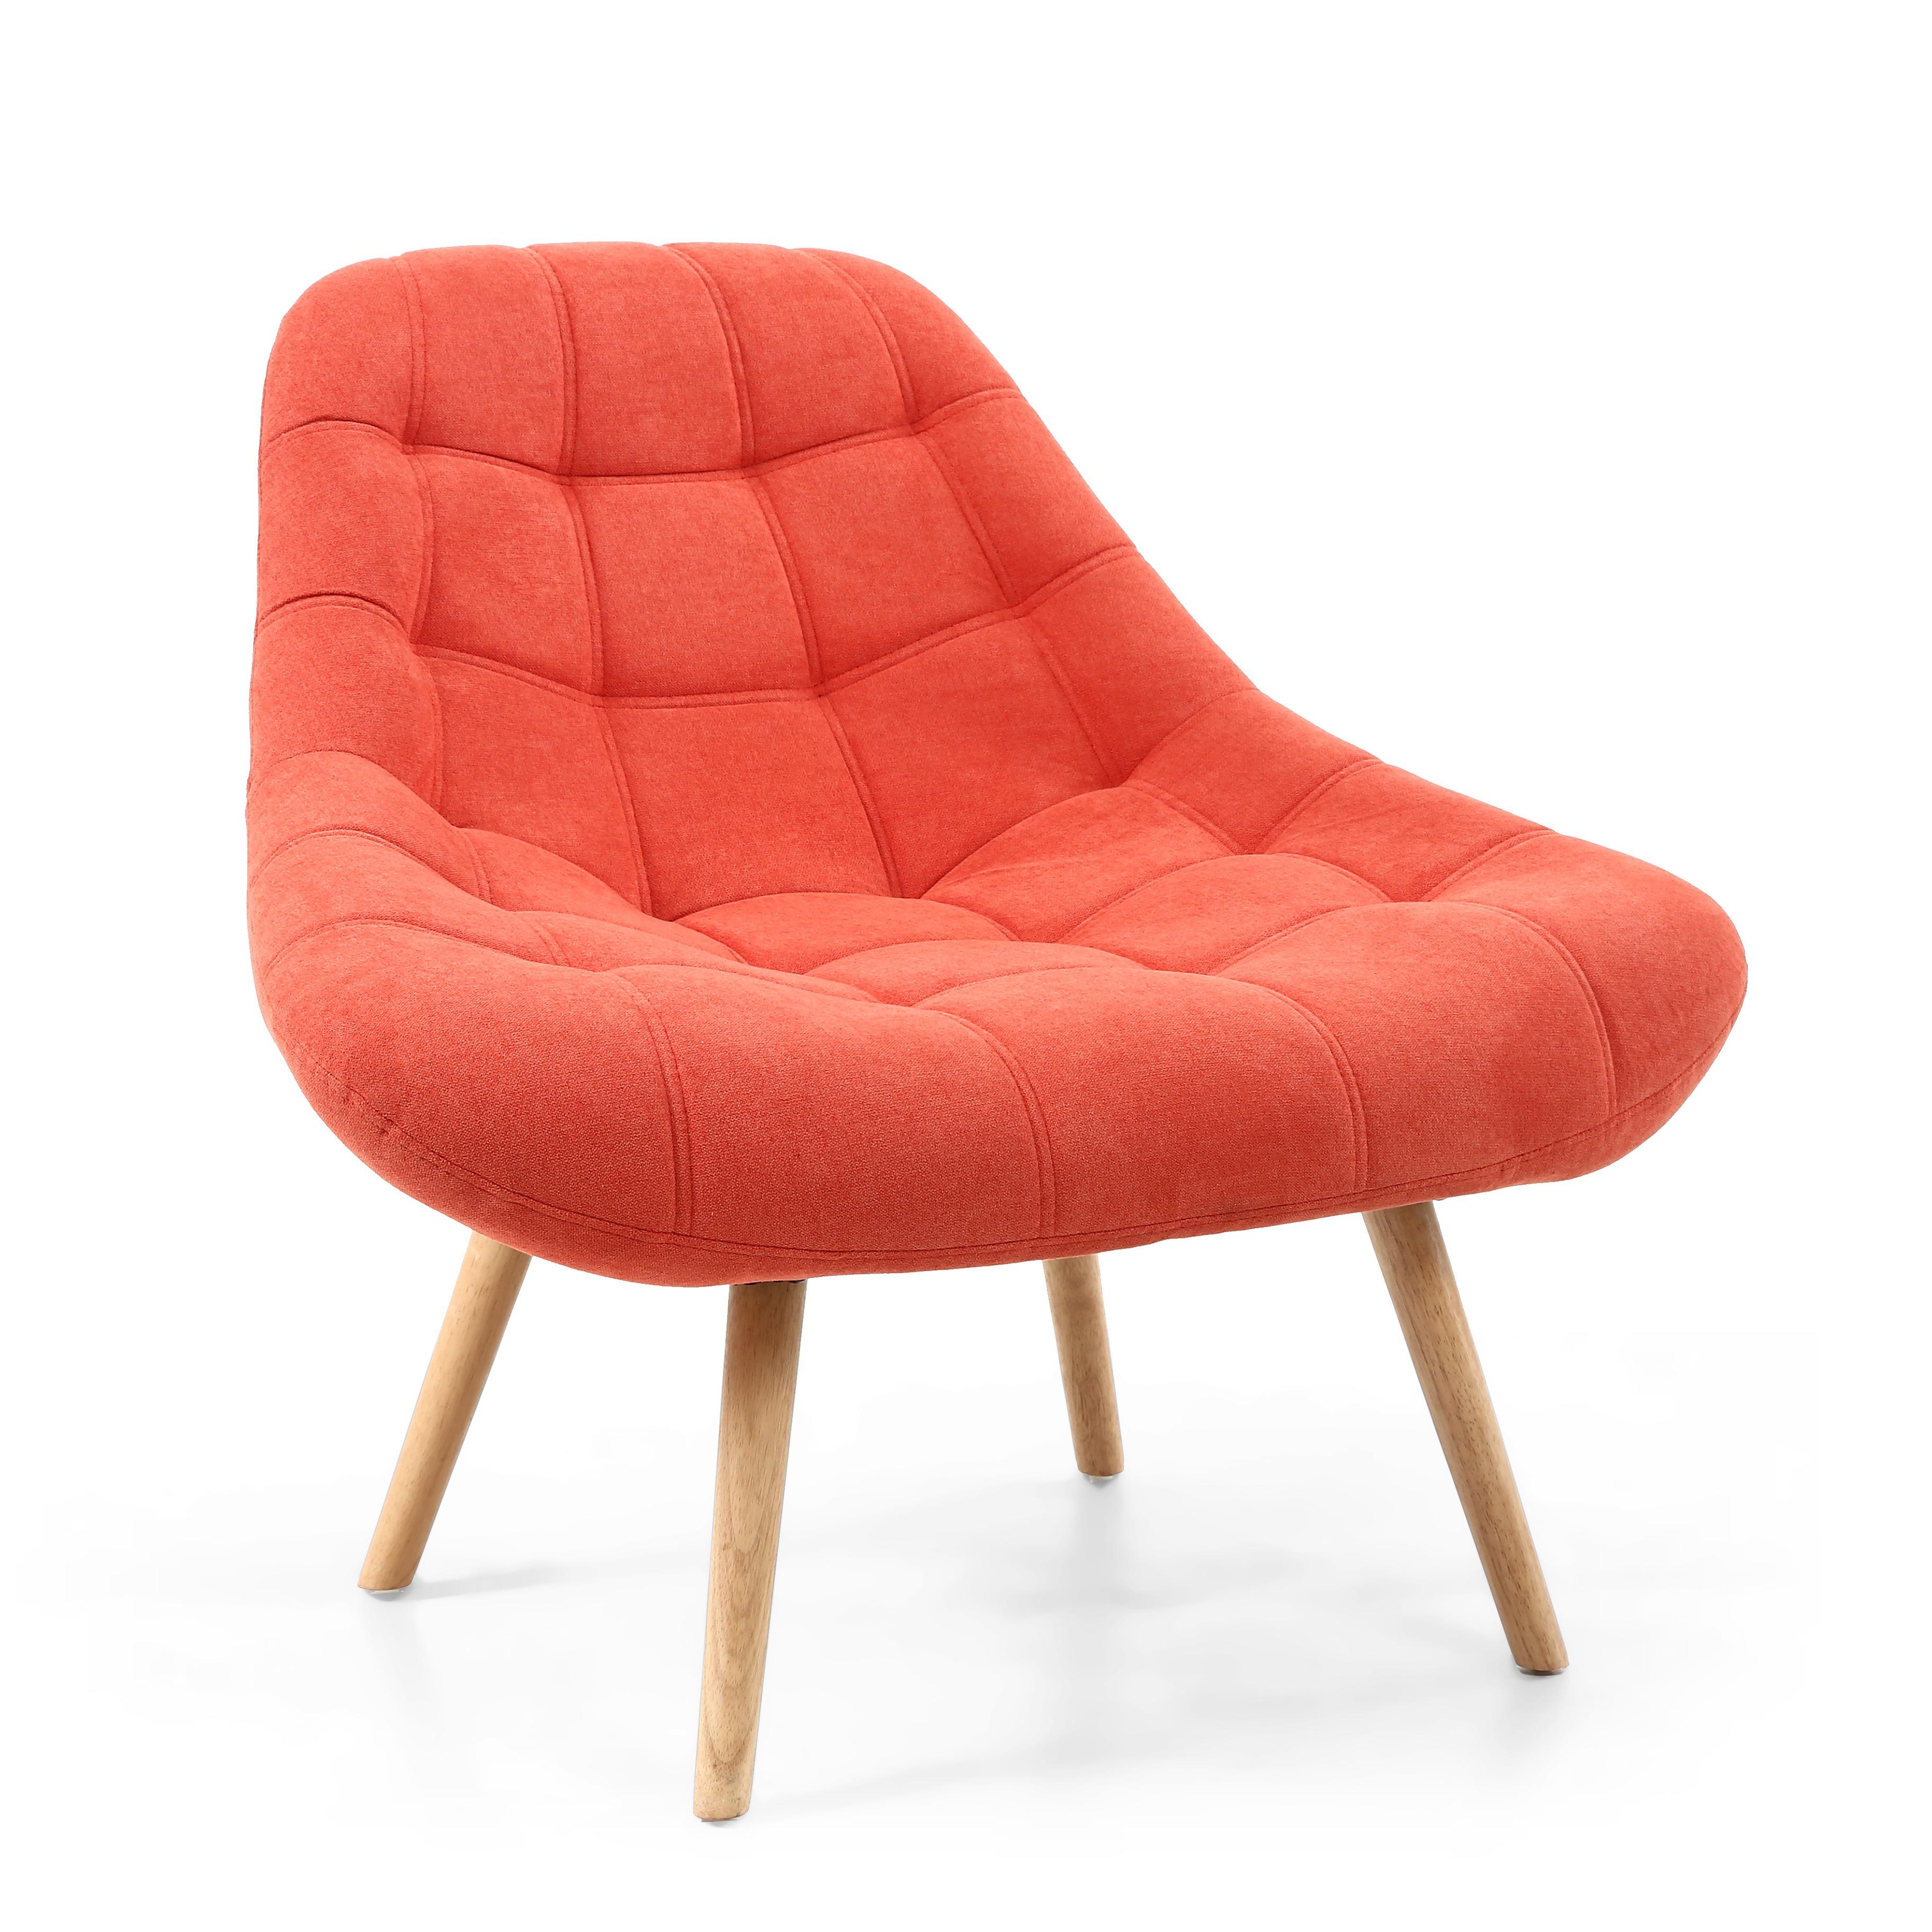 Alison Orange Retro Armchair